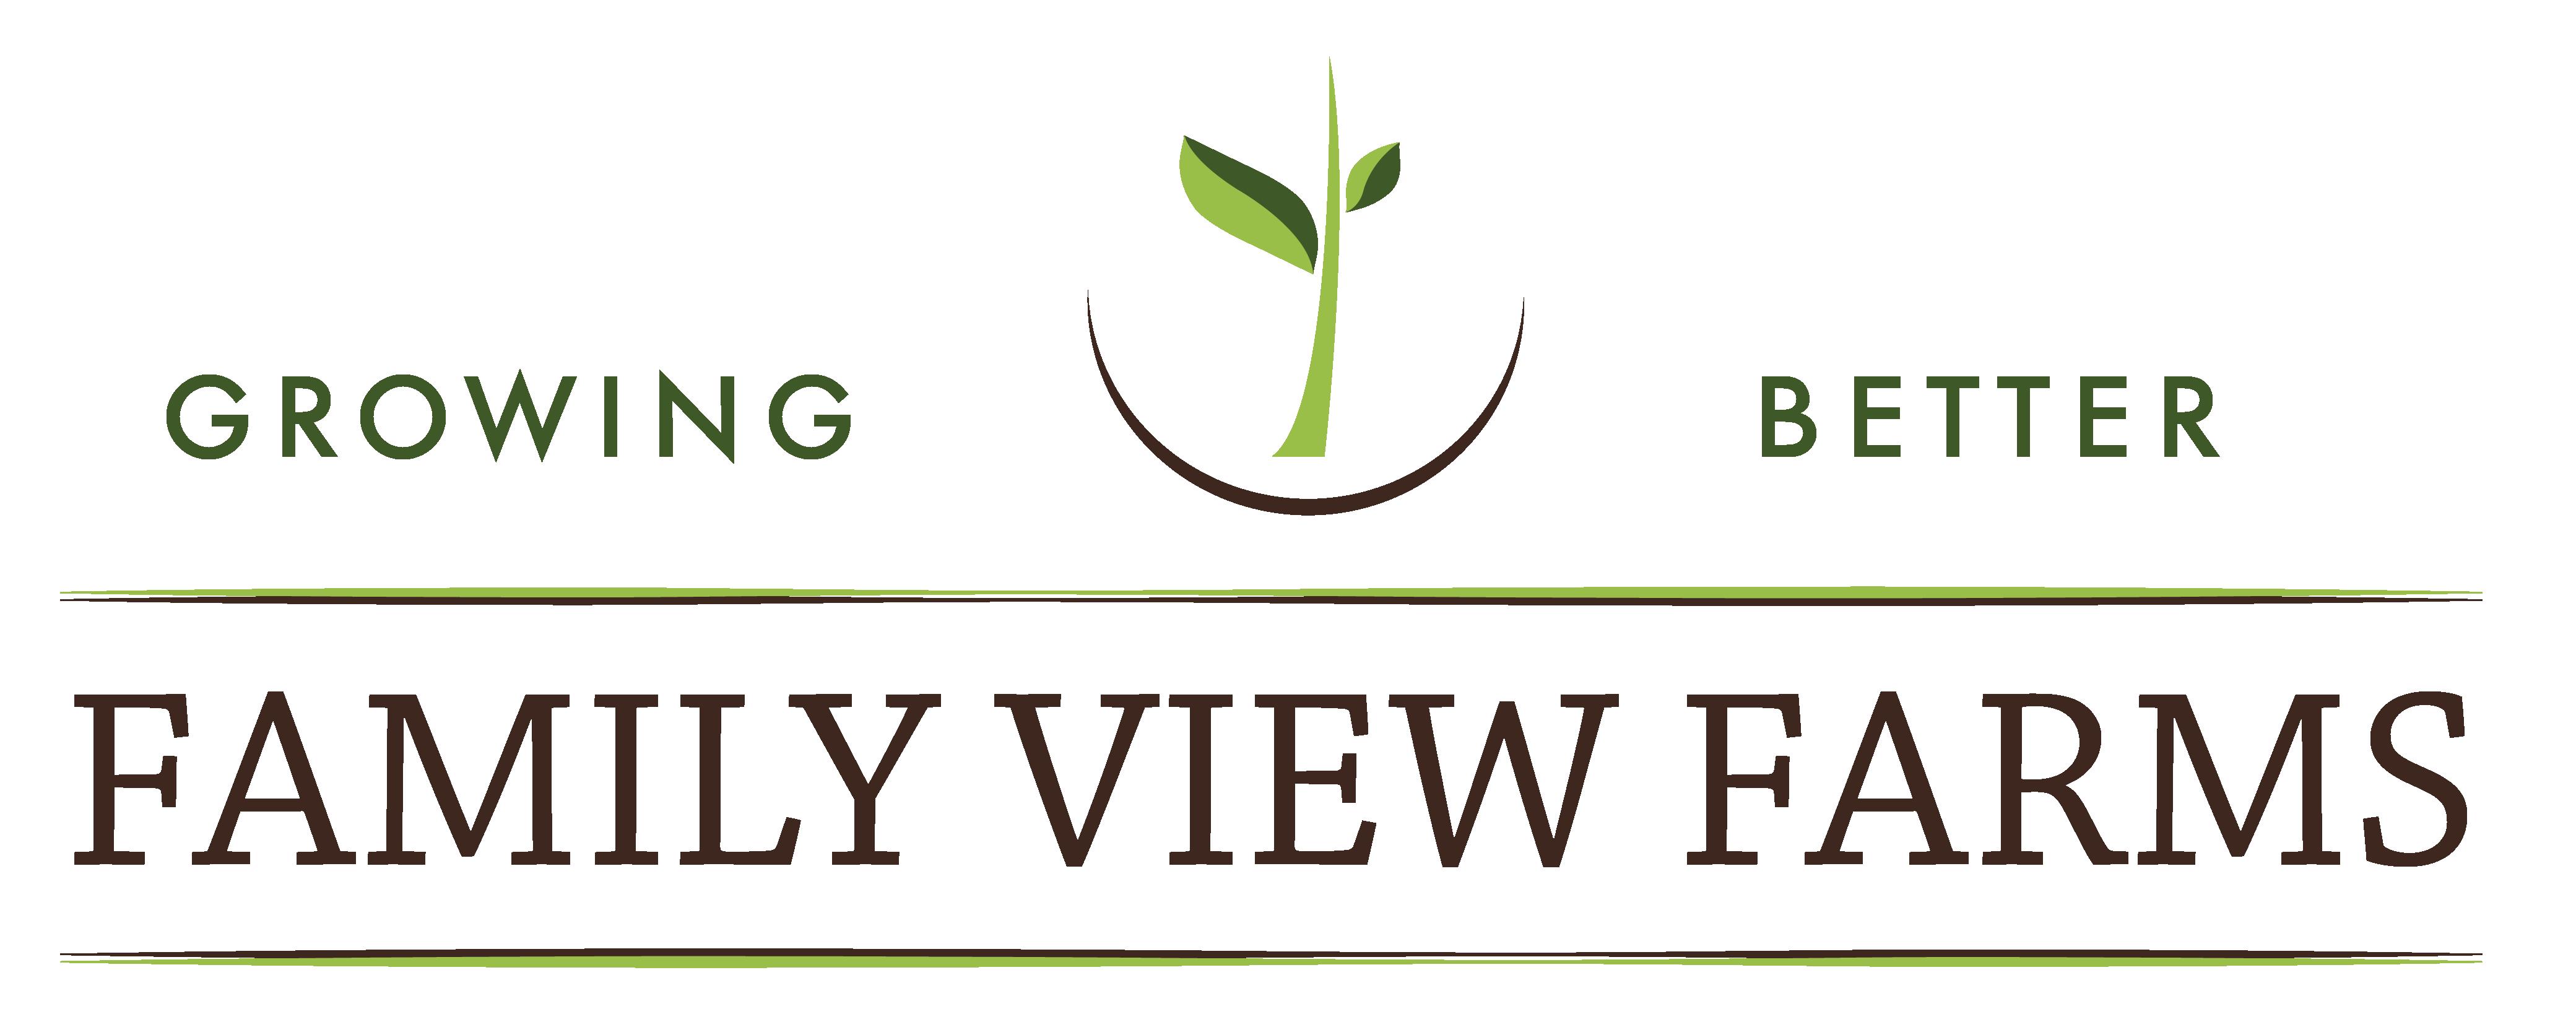 Family View Farms